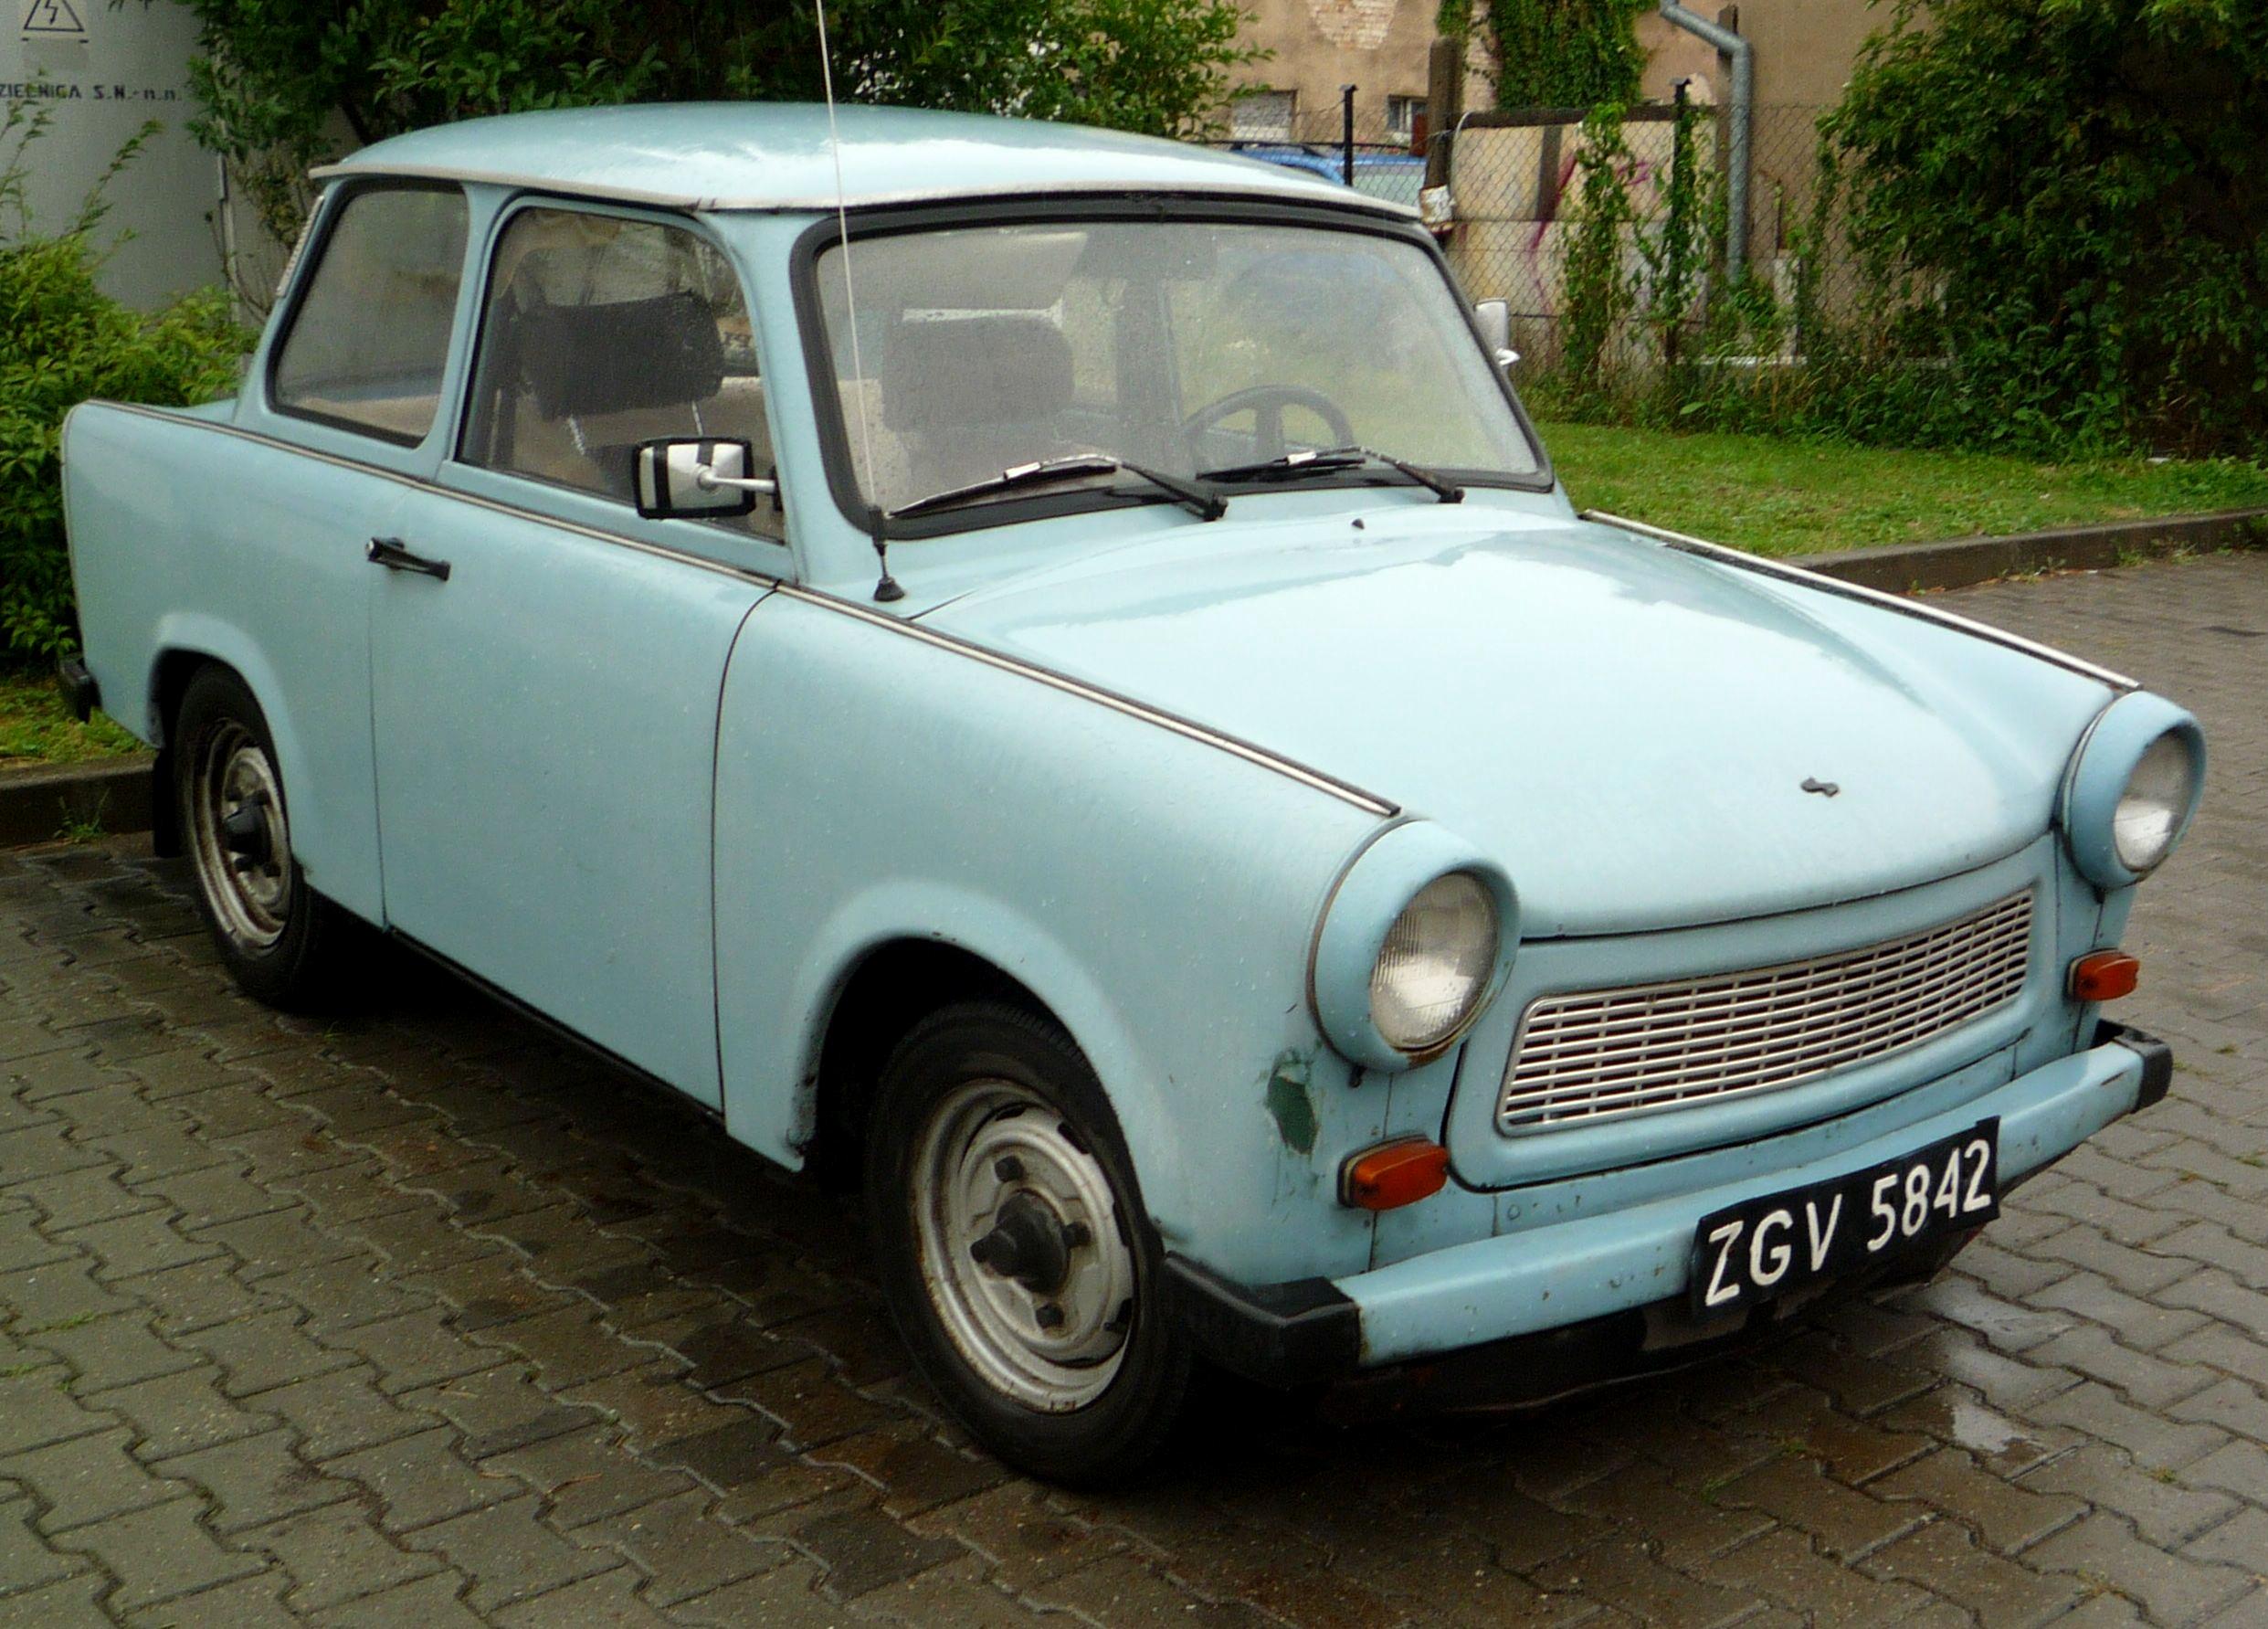 Used Cars In Germany For Sale In Frankfurt